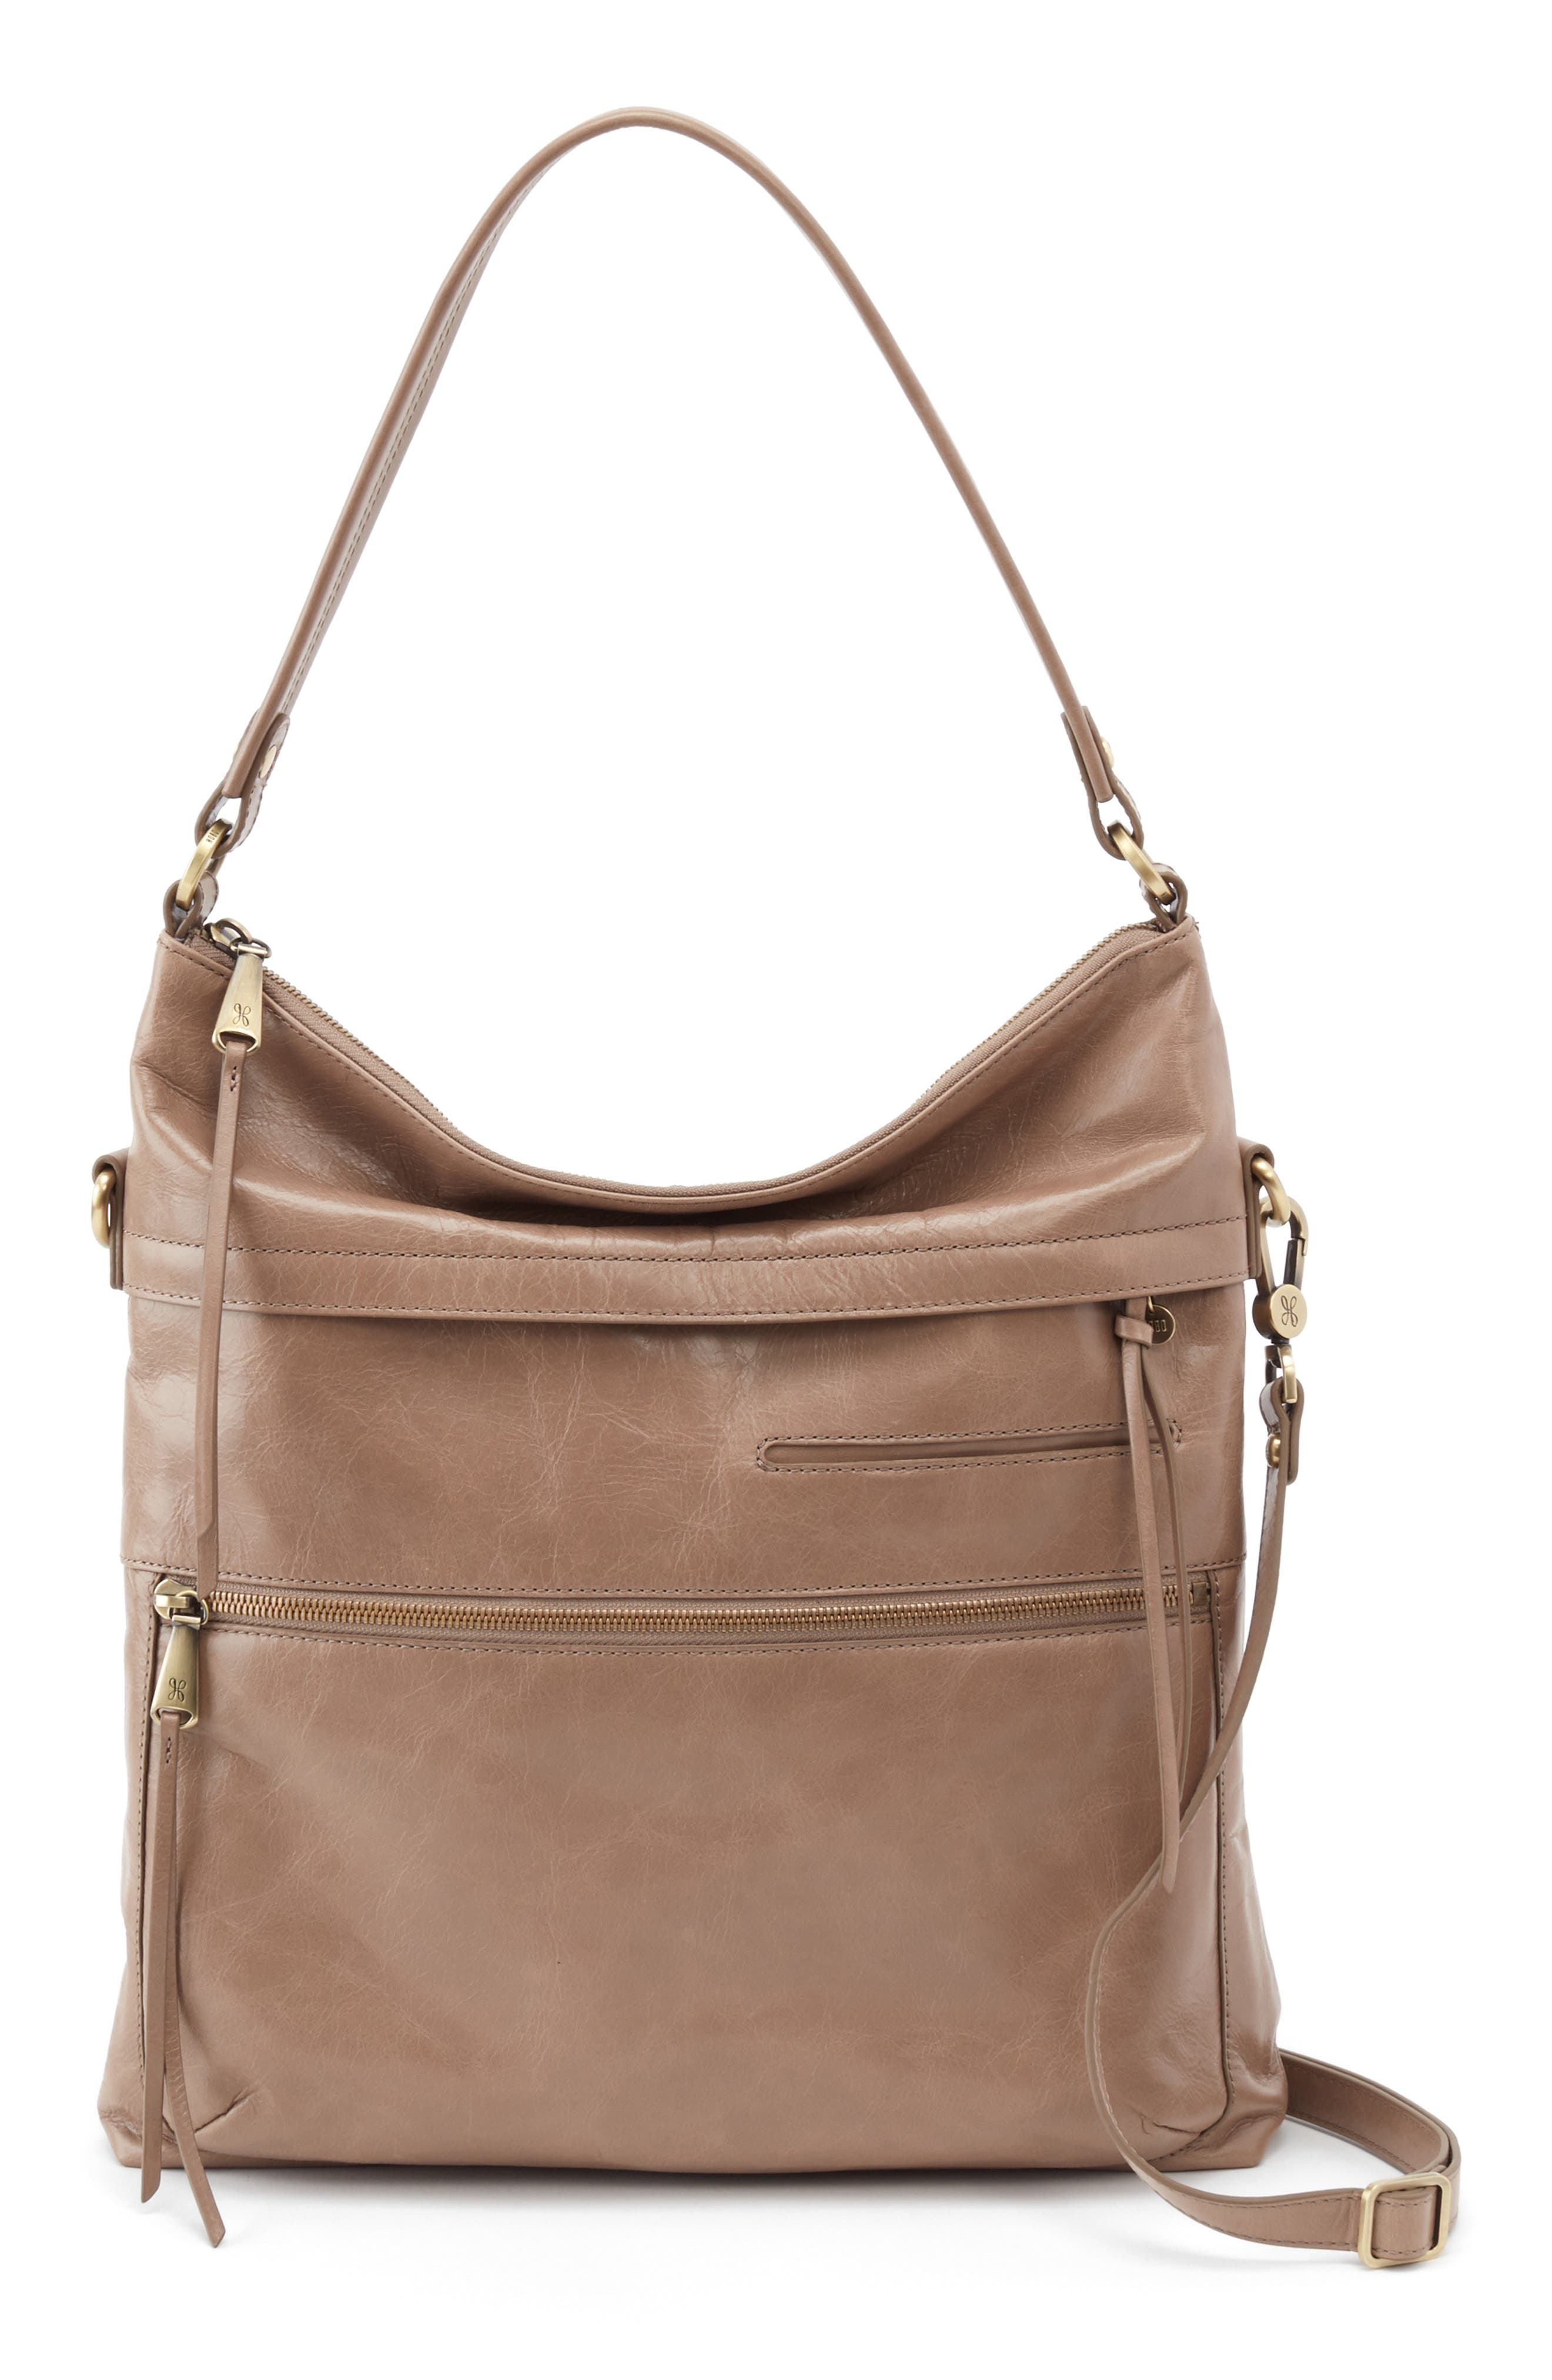 442fca325d0db6 Bucket Bags for Women | Nordstrom